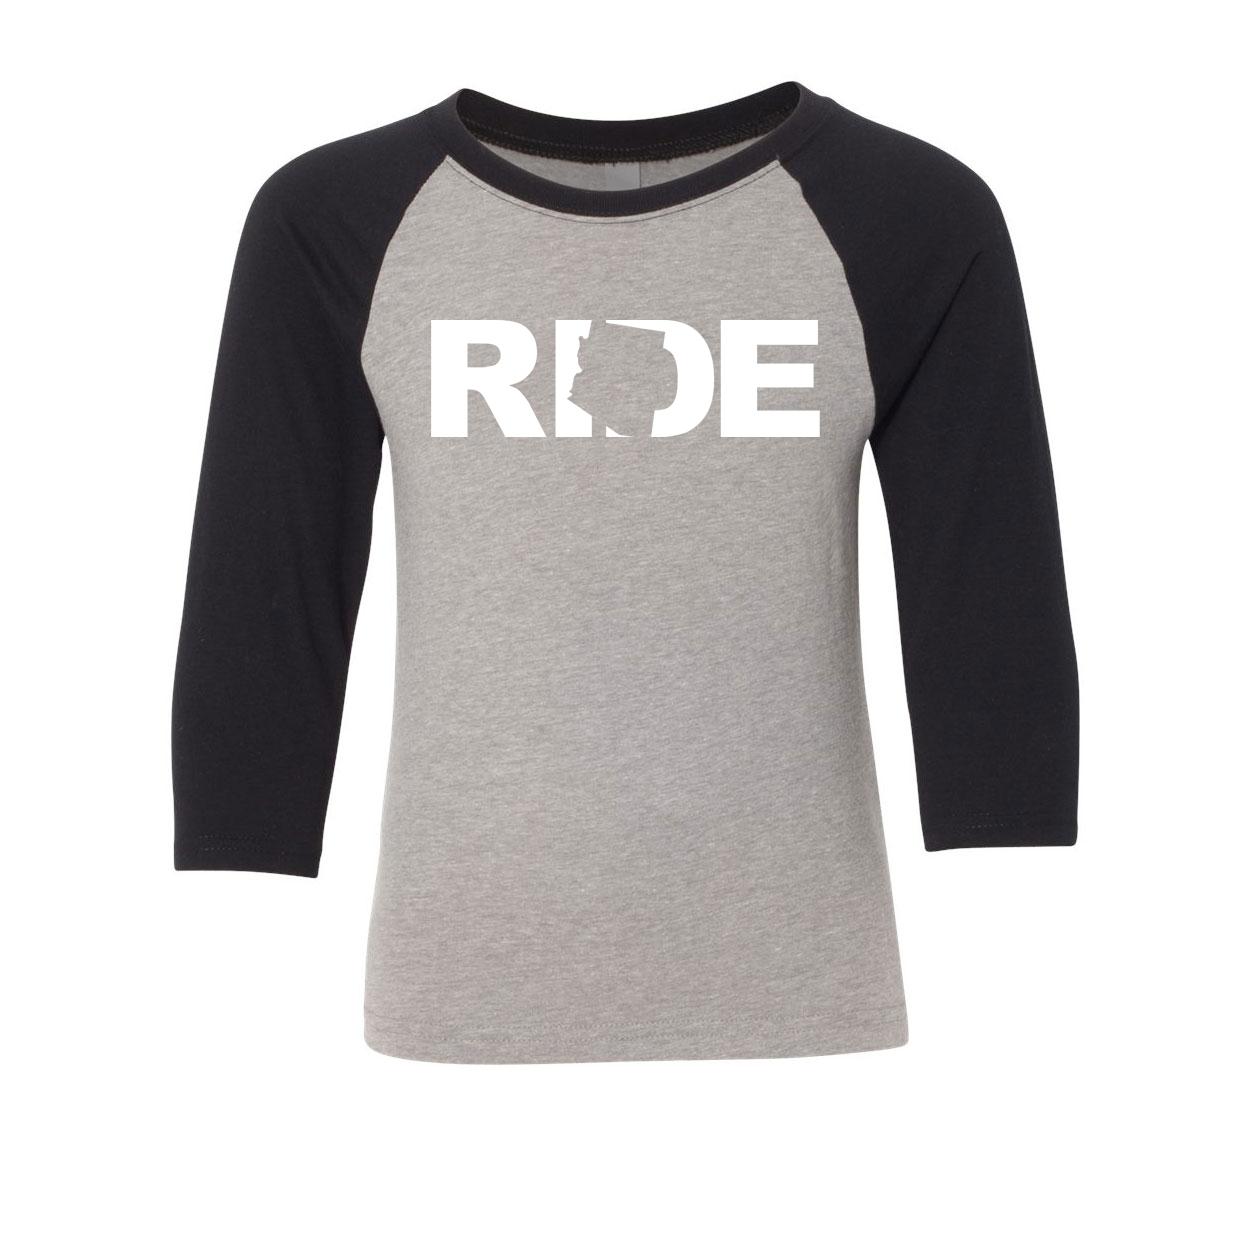 Ride Arizona Classic Youth Premium Raglan Shirt Gray/Black (White Logo)